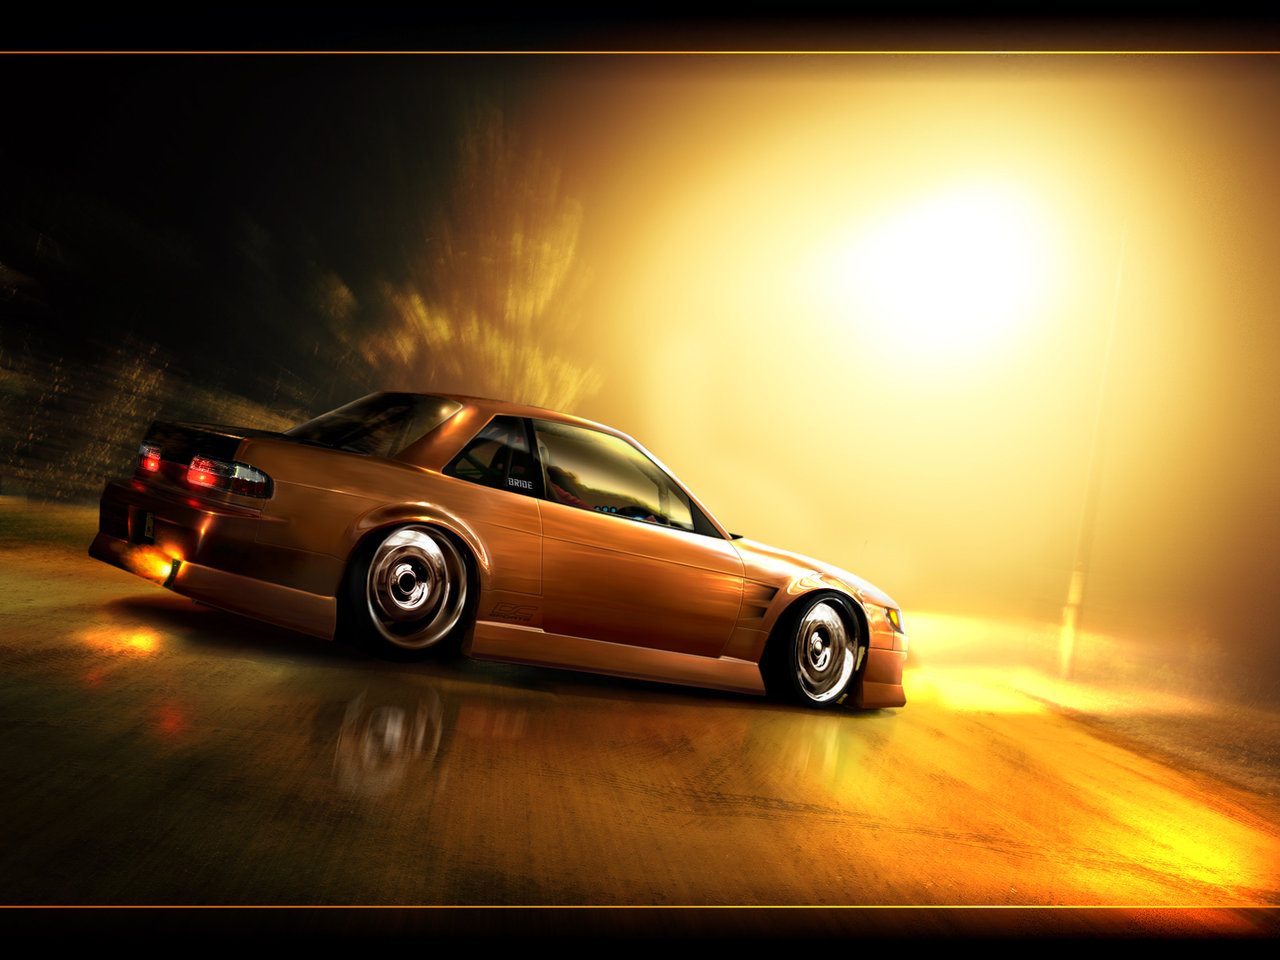 http://1.bp.blogspot.com/_LpXiFKlaY4w/S95NCKdSCxI/AAAAAAAABDs/BomlHU_Cjuc/s1600/Nissan_S13_Silvia.jpg